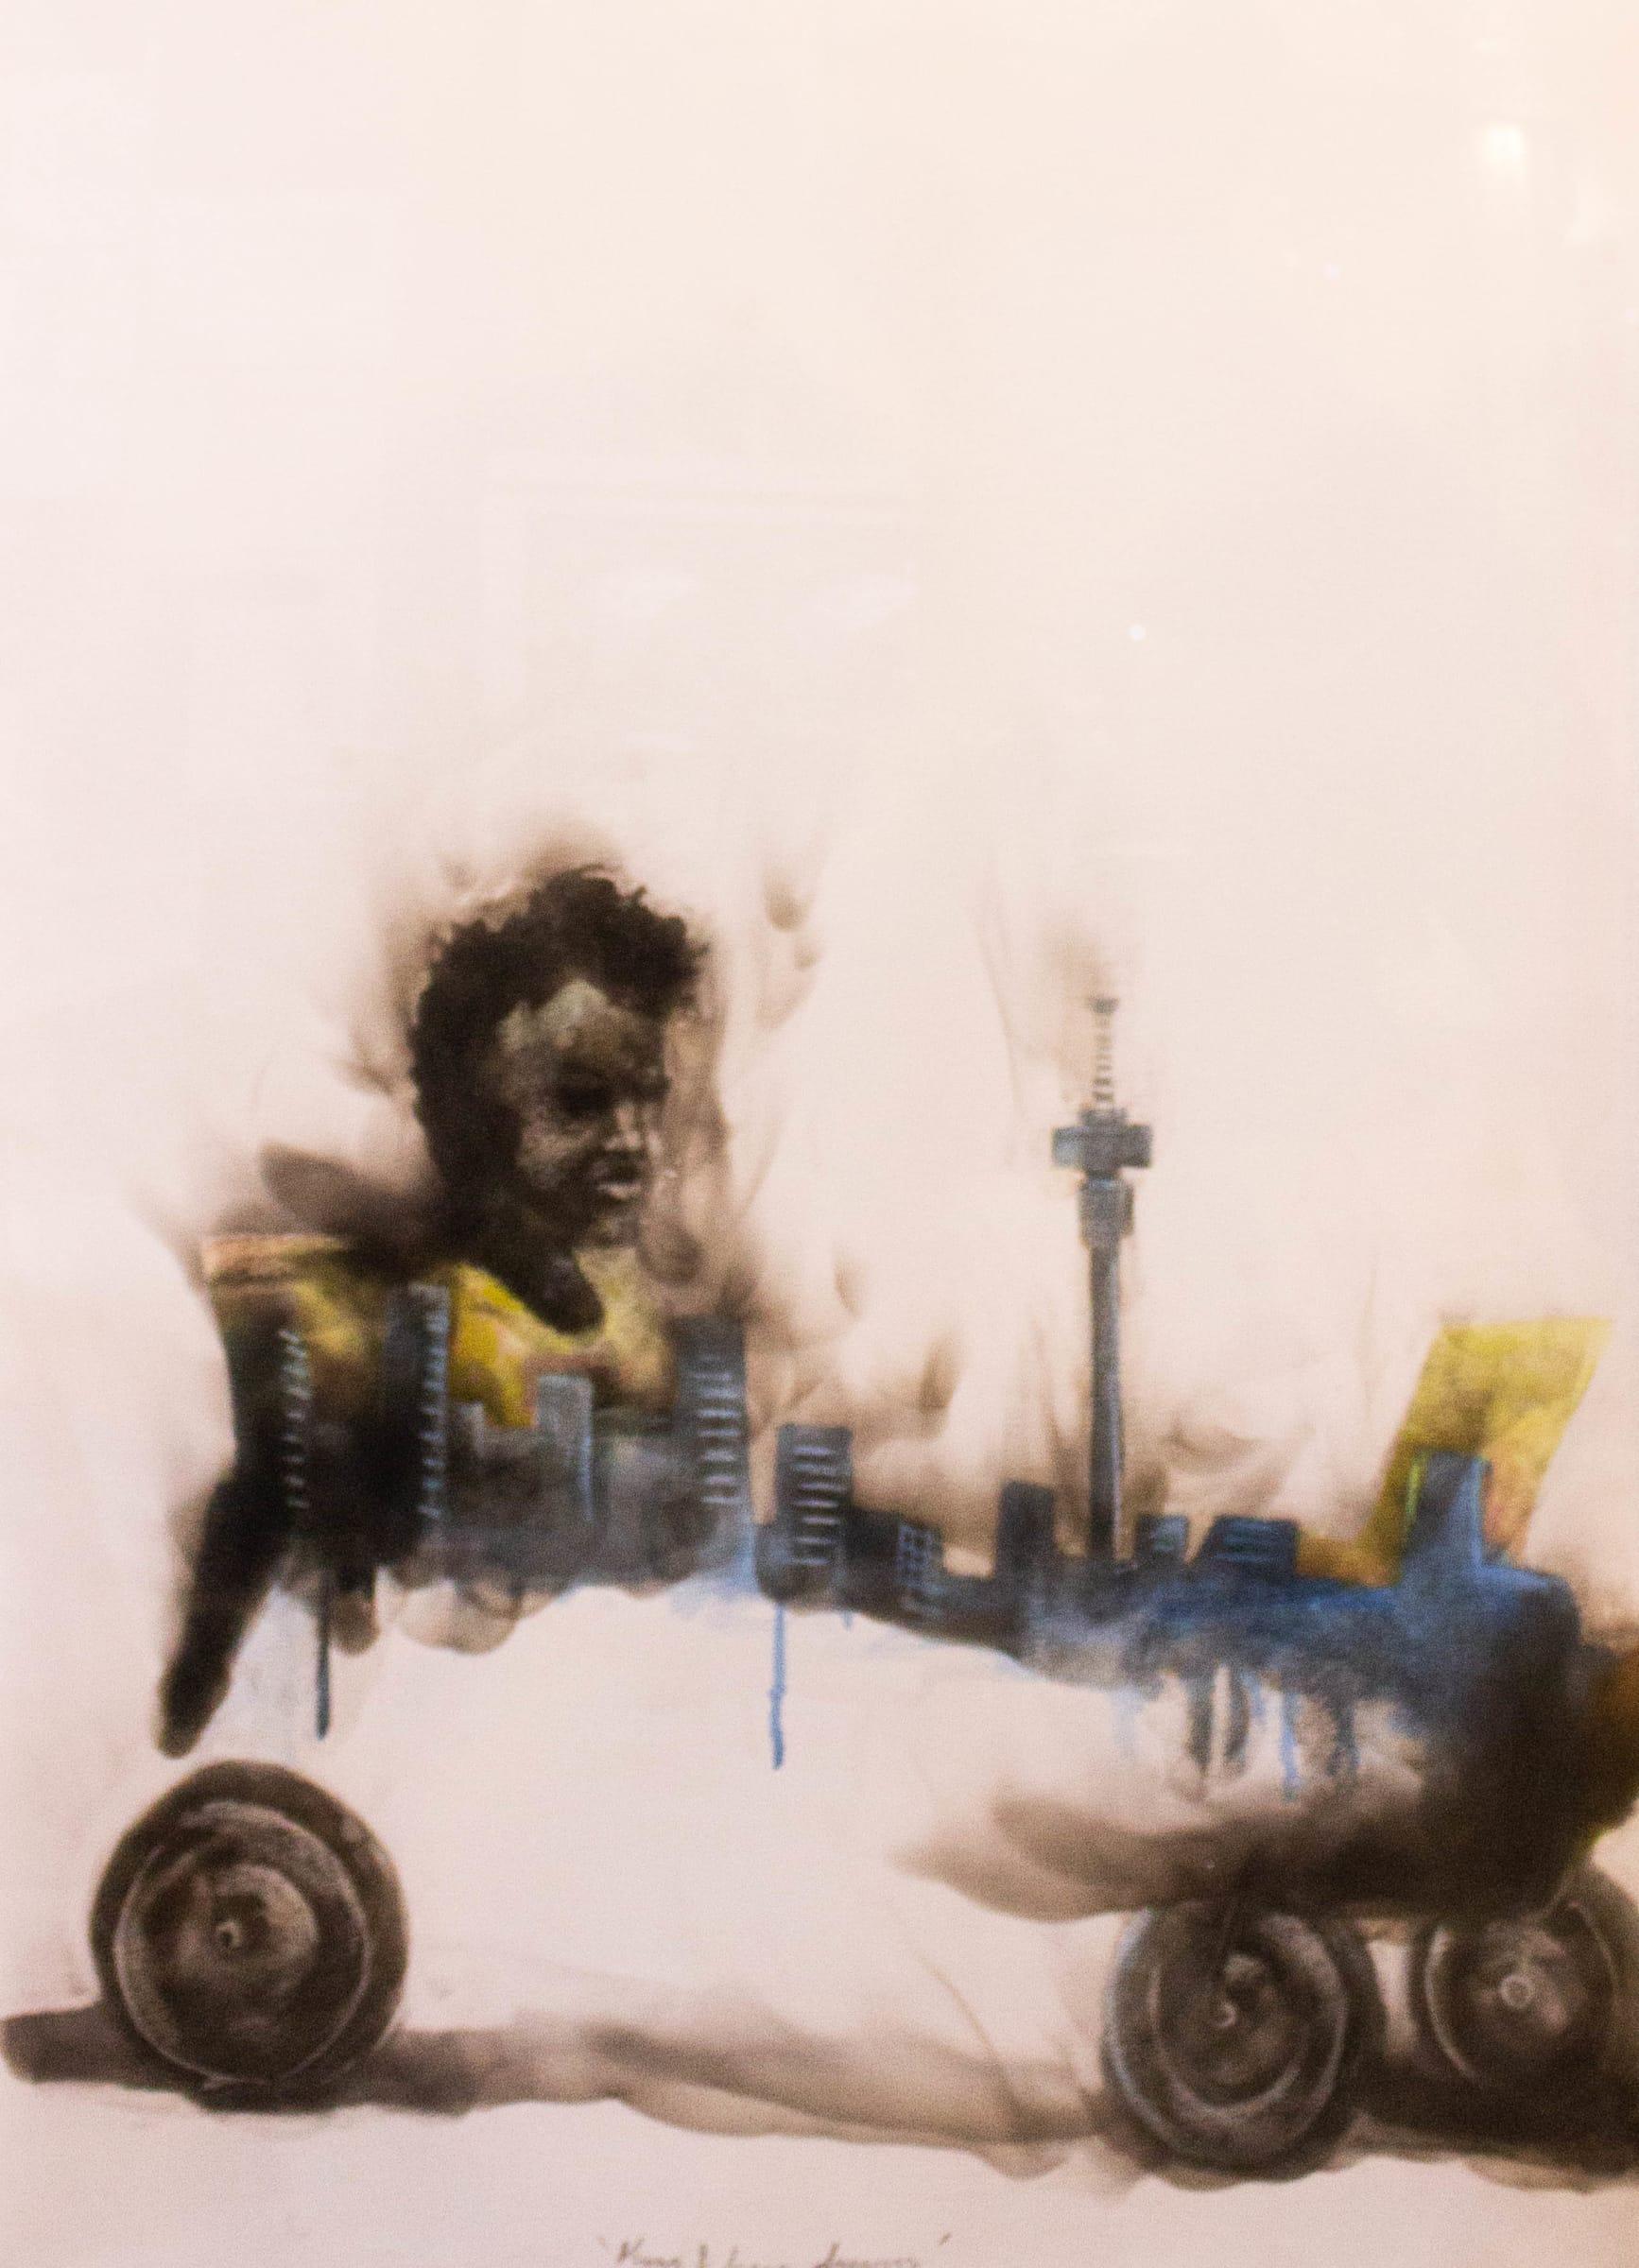 <span class=&#34;link fancybox-details-link&#34;><a href=&#34;/artists/54-azael-langa/works/2140-azael-langa-mum-i-have-dreams-2018/&#34;>View Detail Page</a></span><div class=&#34;artist&#34;><strong>Azael Langa</strong></div> <div class=&#34;title&#34;><em>Mum I Have Dreams</em>, 2018</div> <div class=&#34;medium&#34;>Smoke And Ink  On Canvas</div> <div class=&#34;dimensions&#34;>120cm x 79cm (138cm x 96cm framed)</div><div class=&#34;price&#34;>R24,800.00</div>